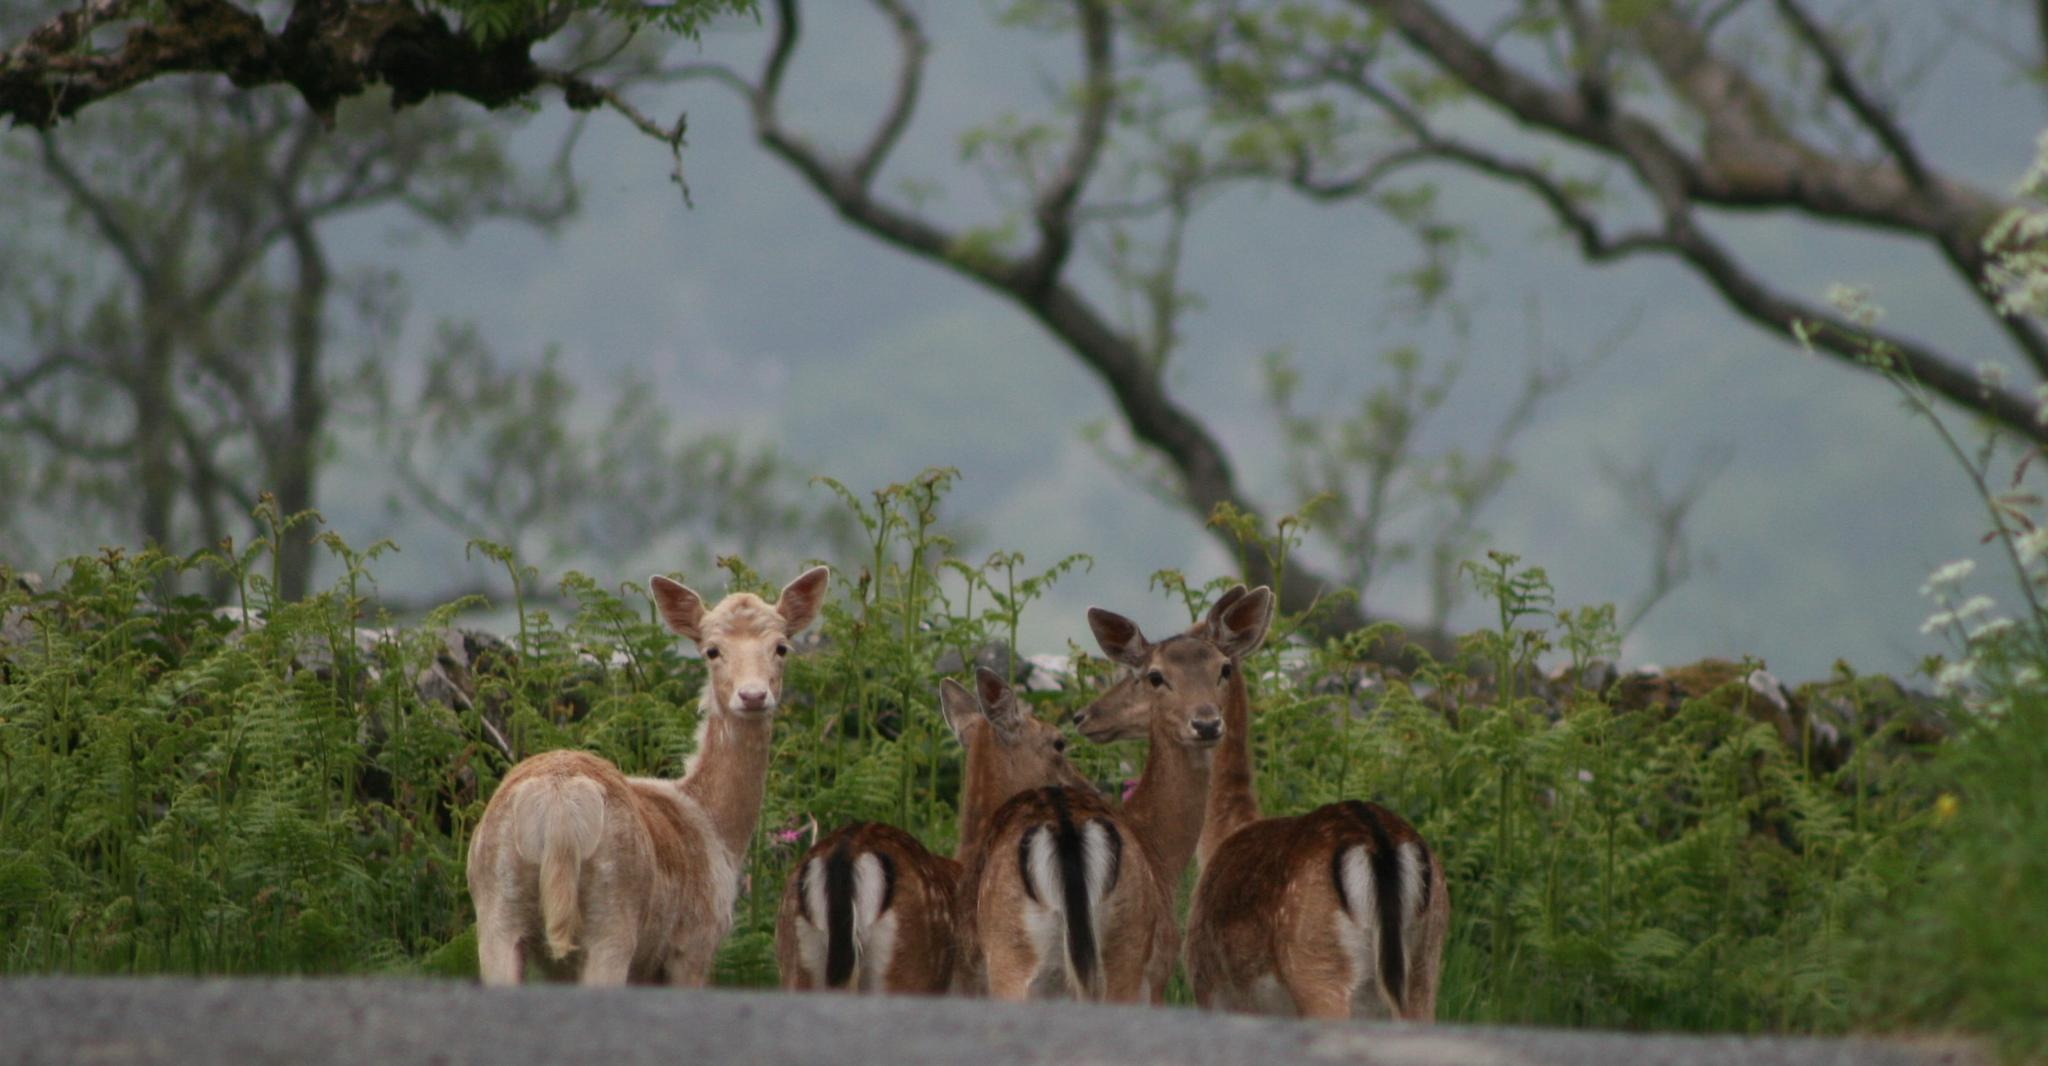 Deer on the Road by ninascotland